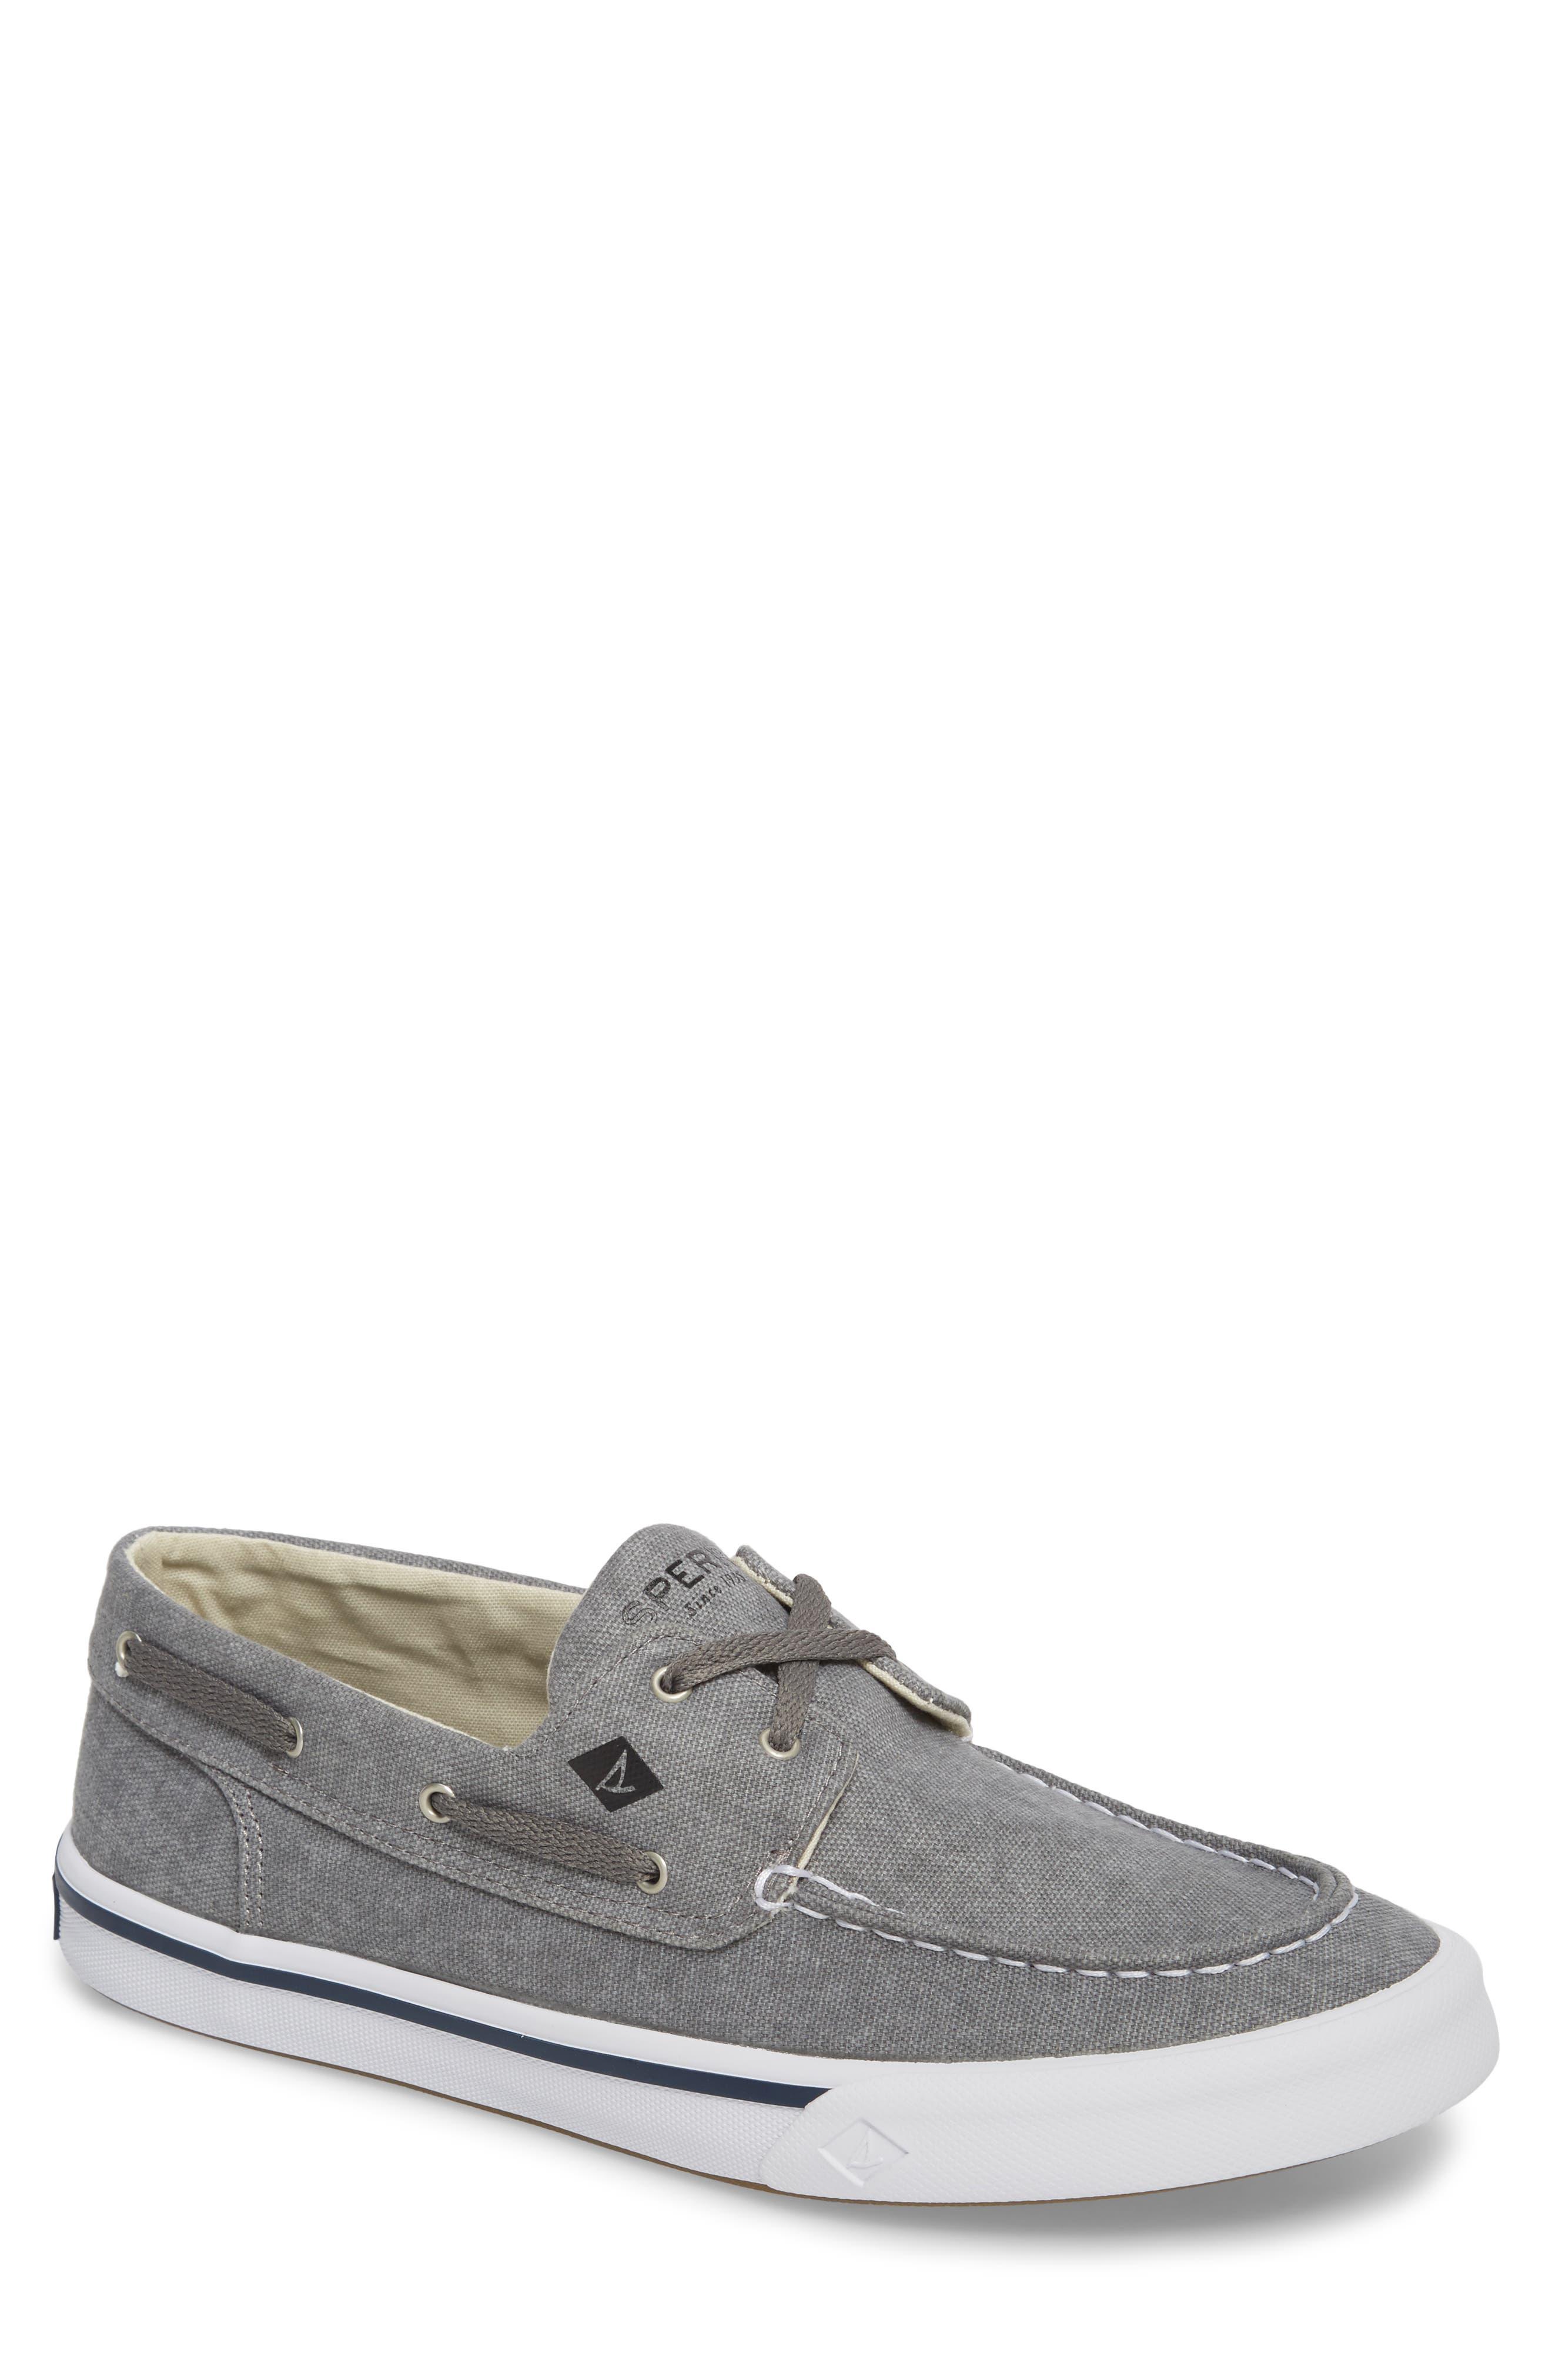 SPERRY, Striper 2 Boat Shoe, Main thumbnail 1, color, GREY CANVAS